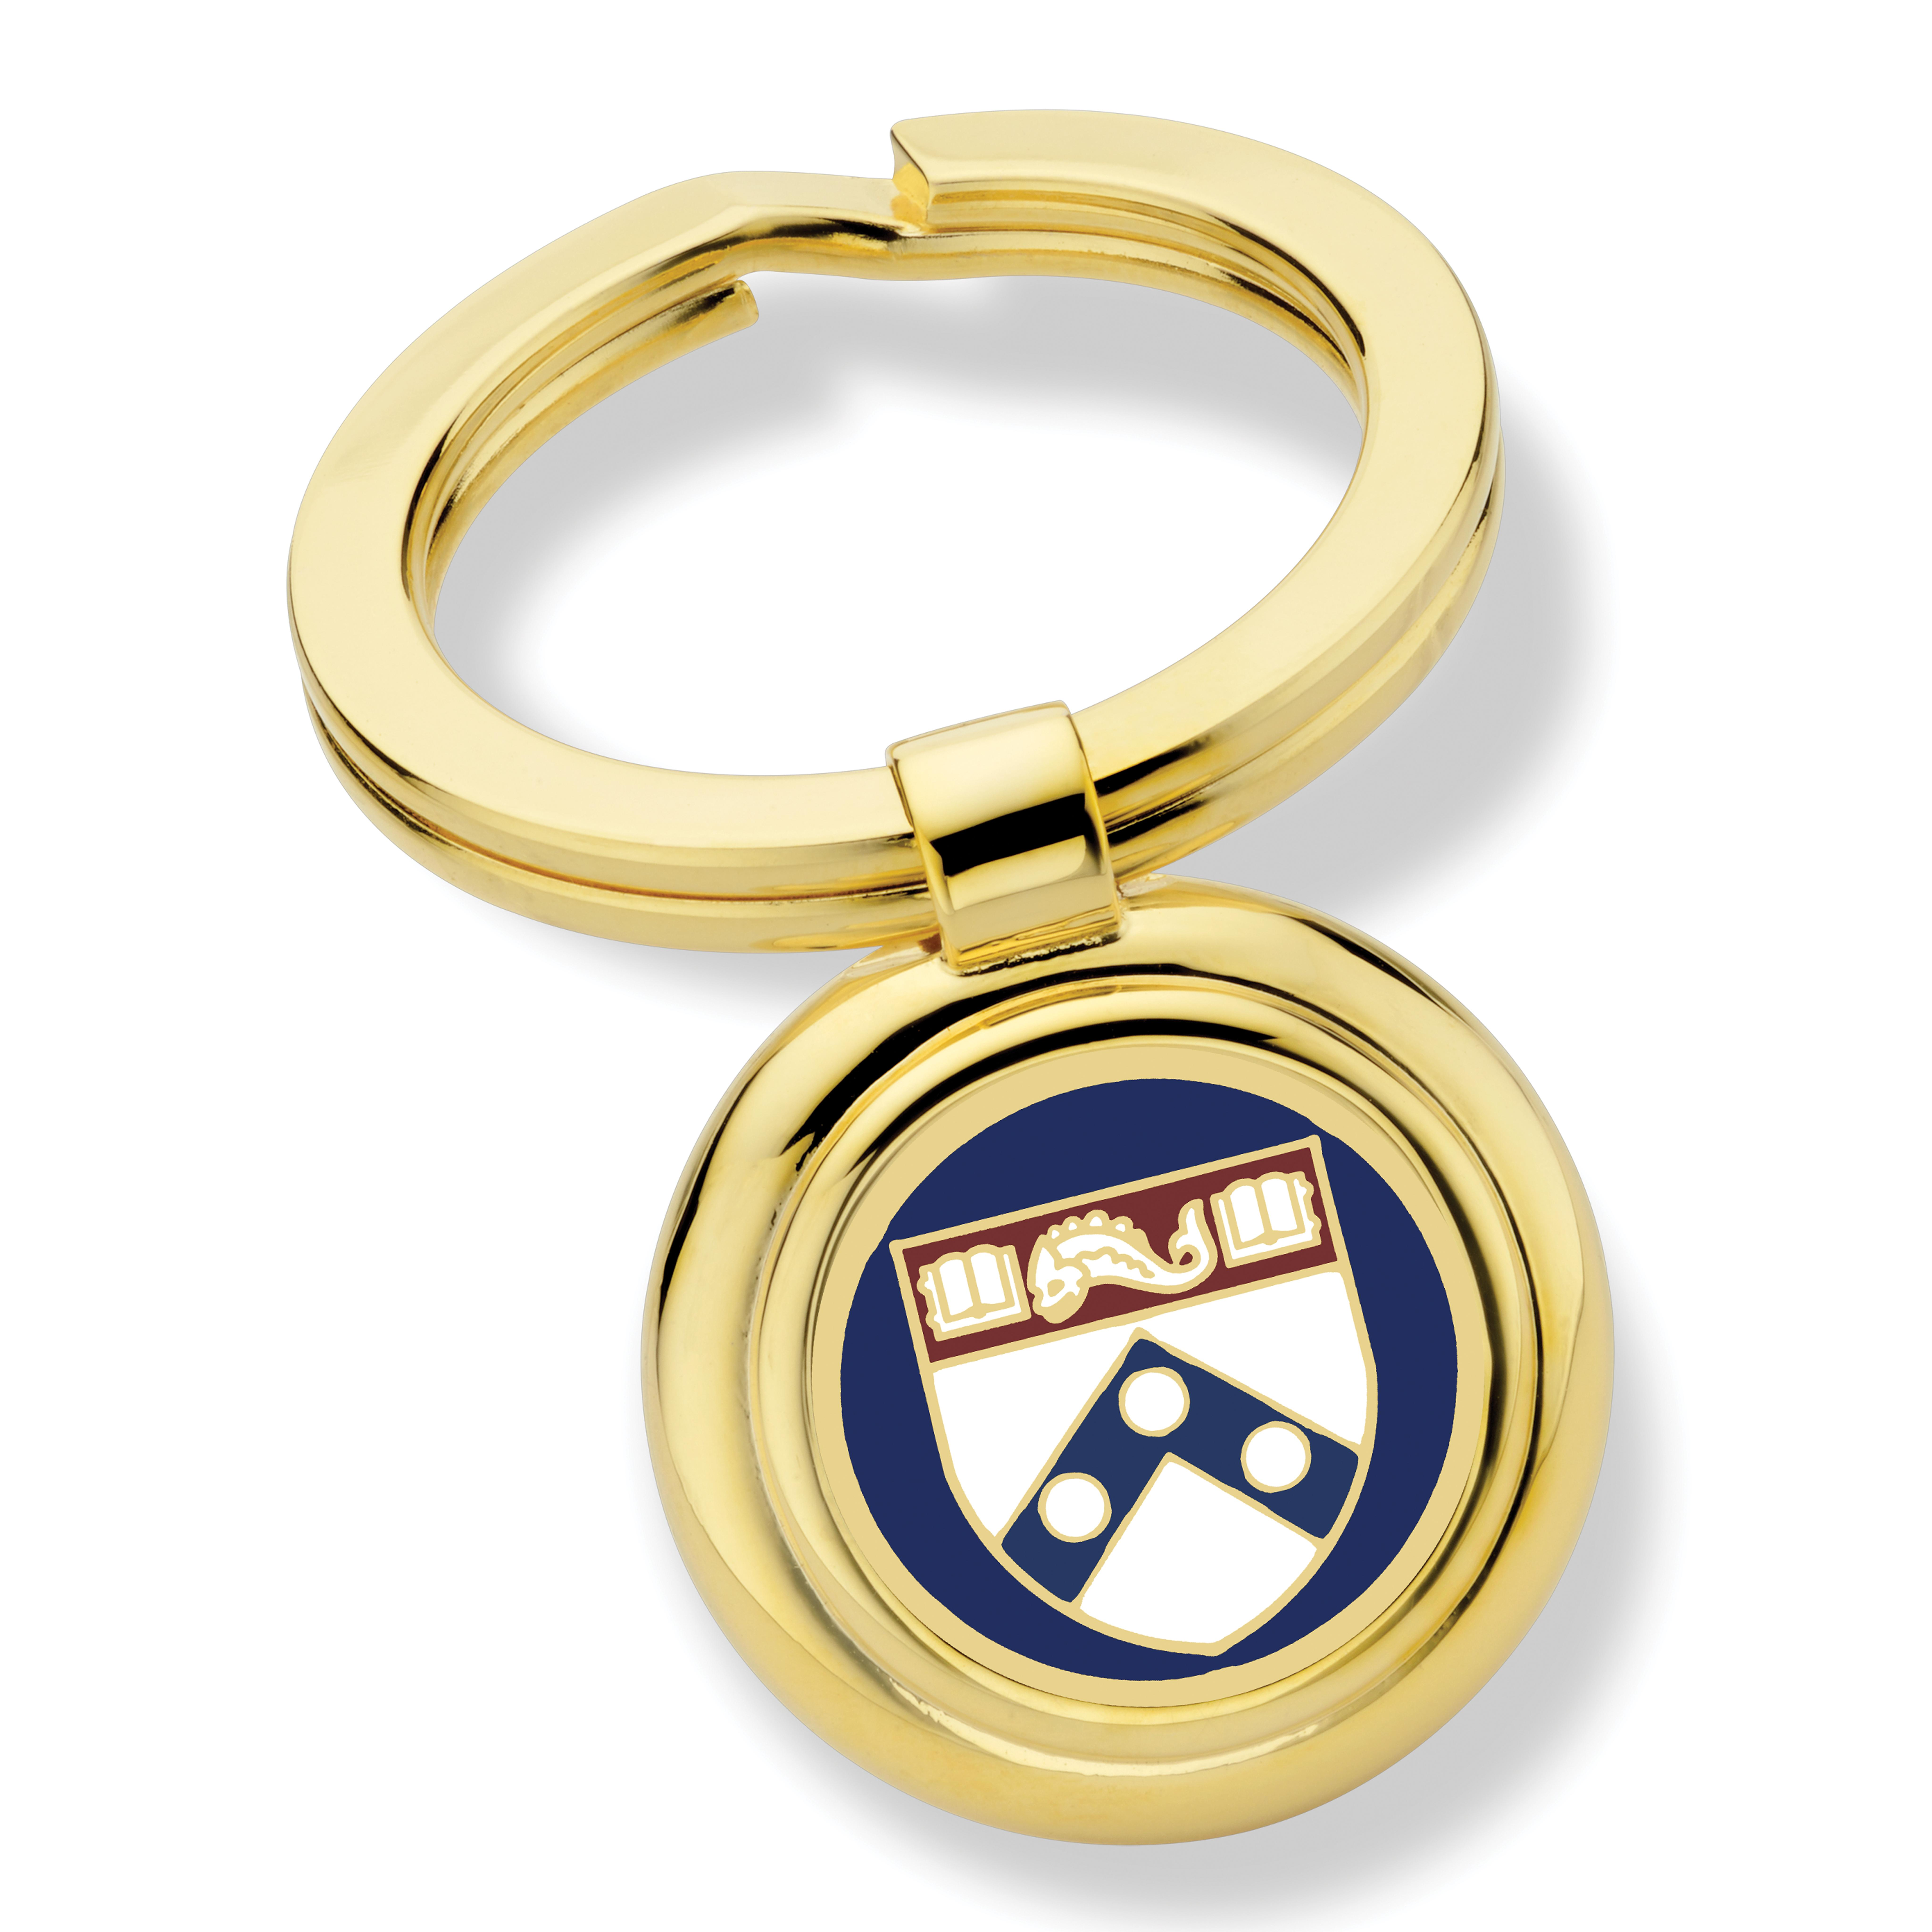 University of Pennsylvania Key Ring